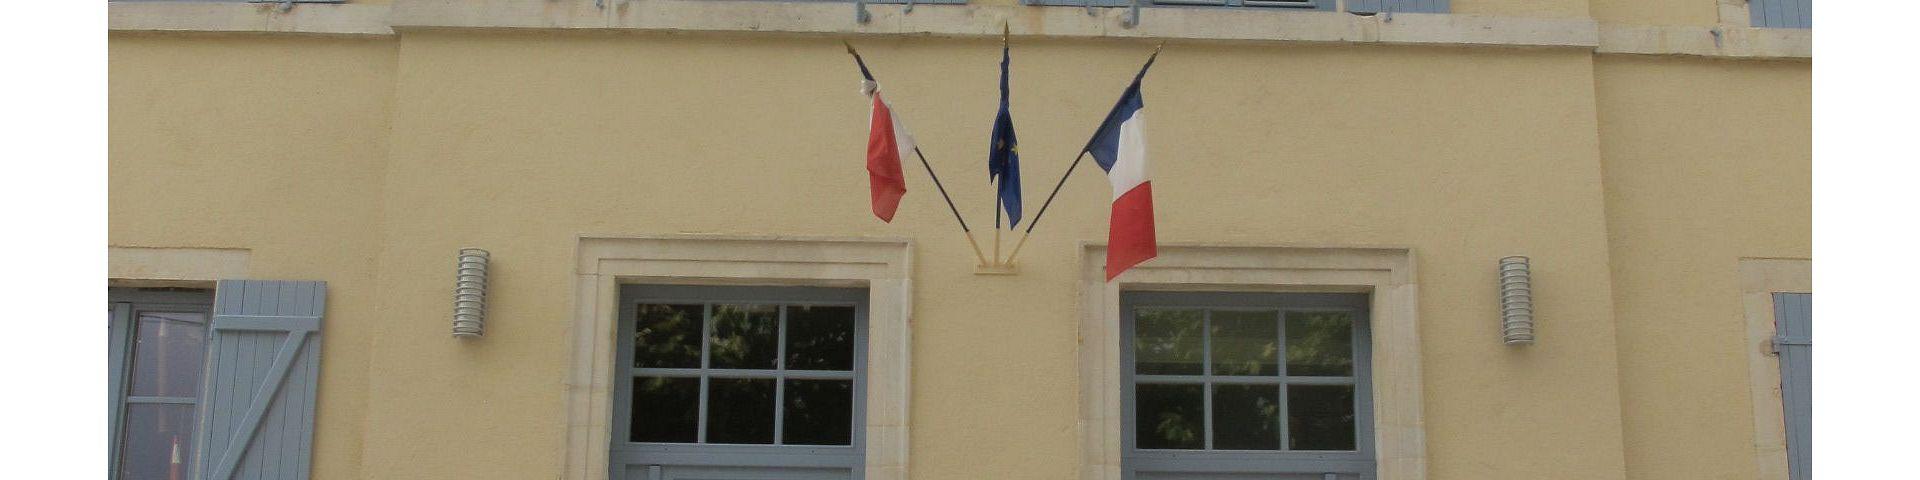 Mavilly-Mandelot - Mairie (21)